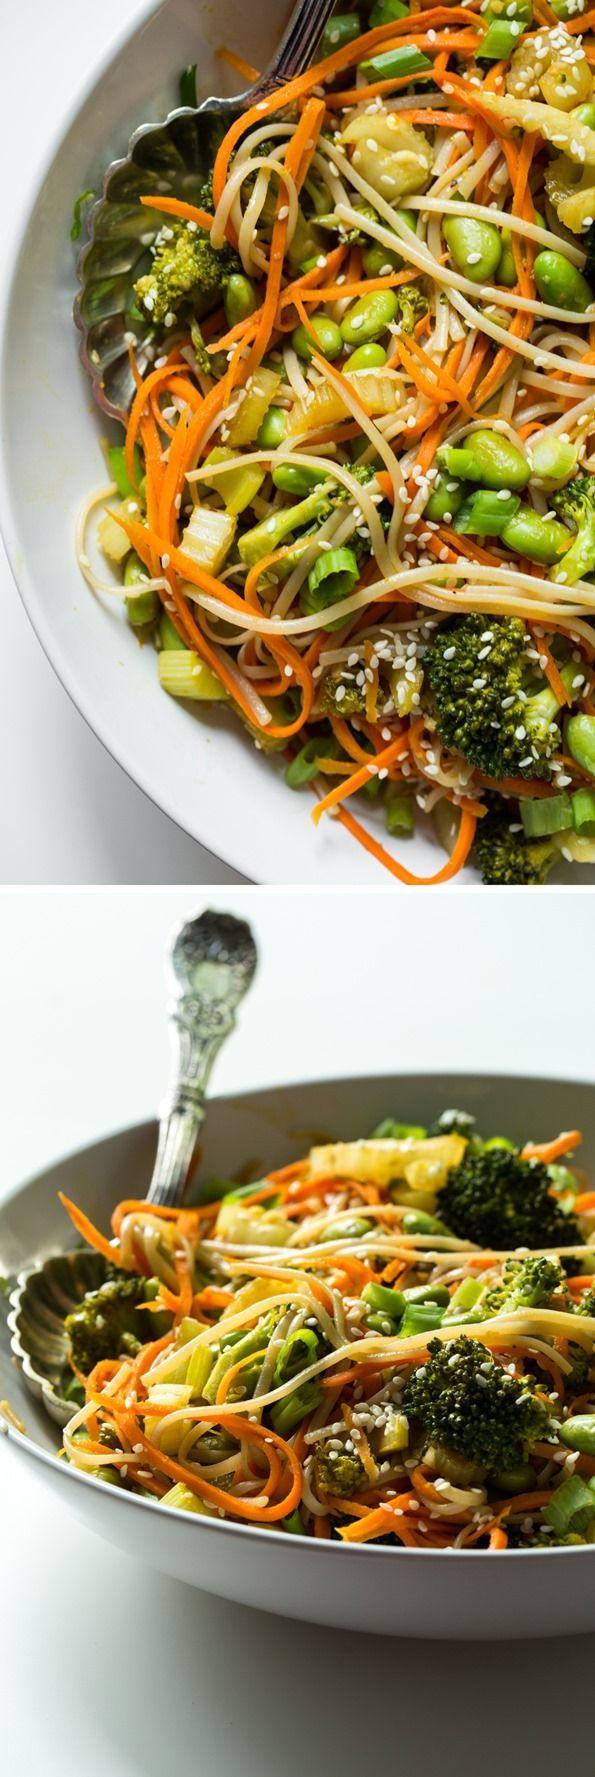 Speedy Veggie 'n Brown Rice Noodle Bowl with Homemade Teriyaki Sauce